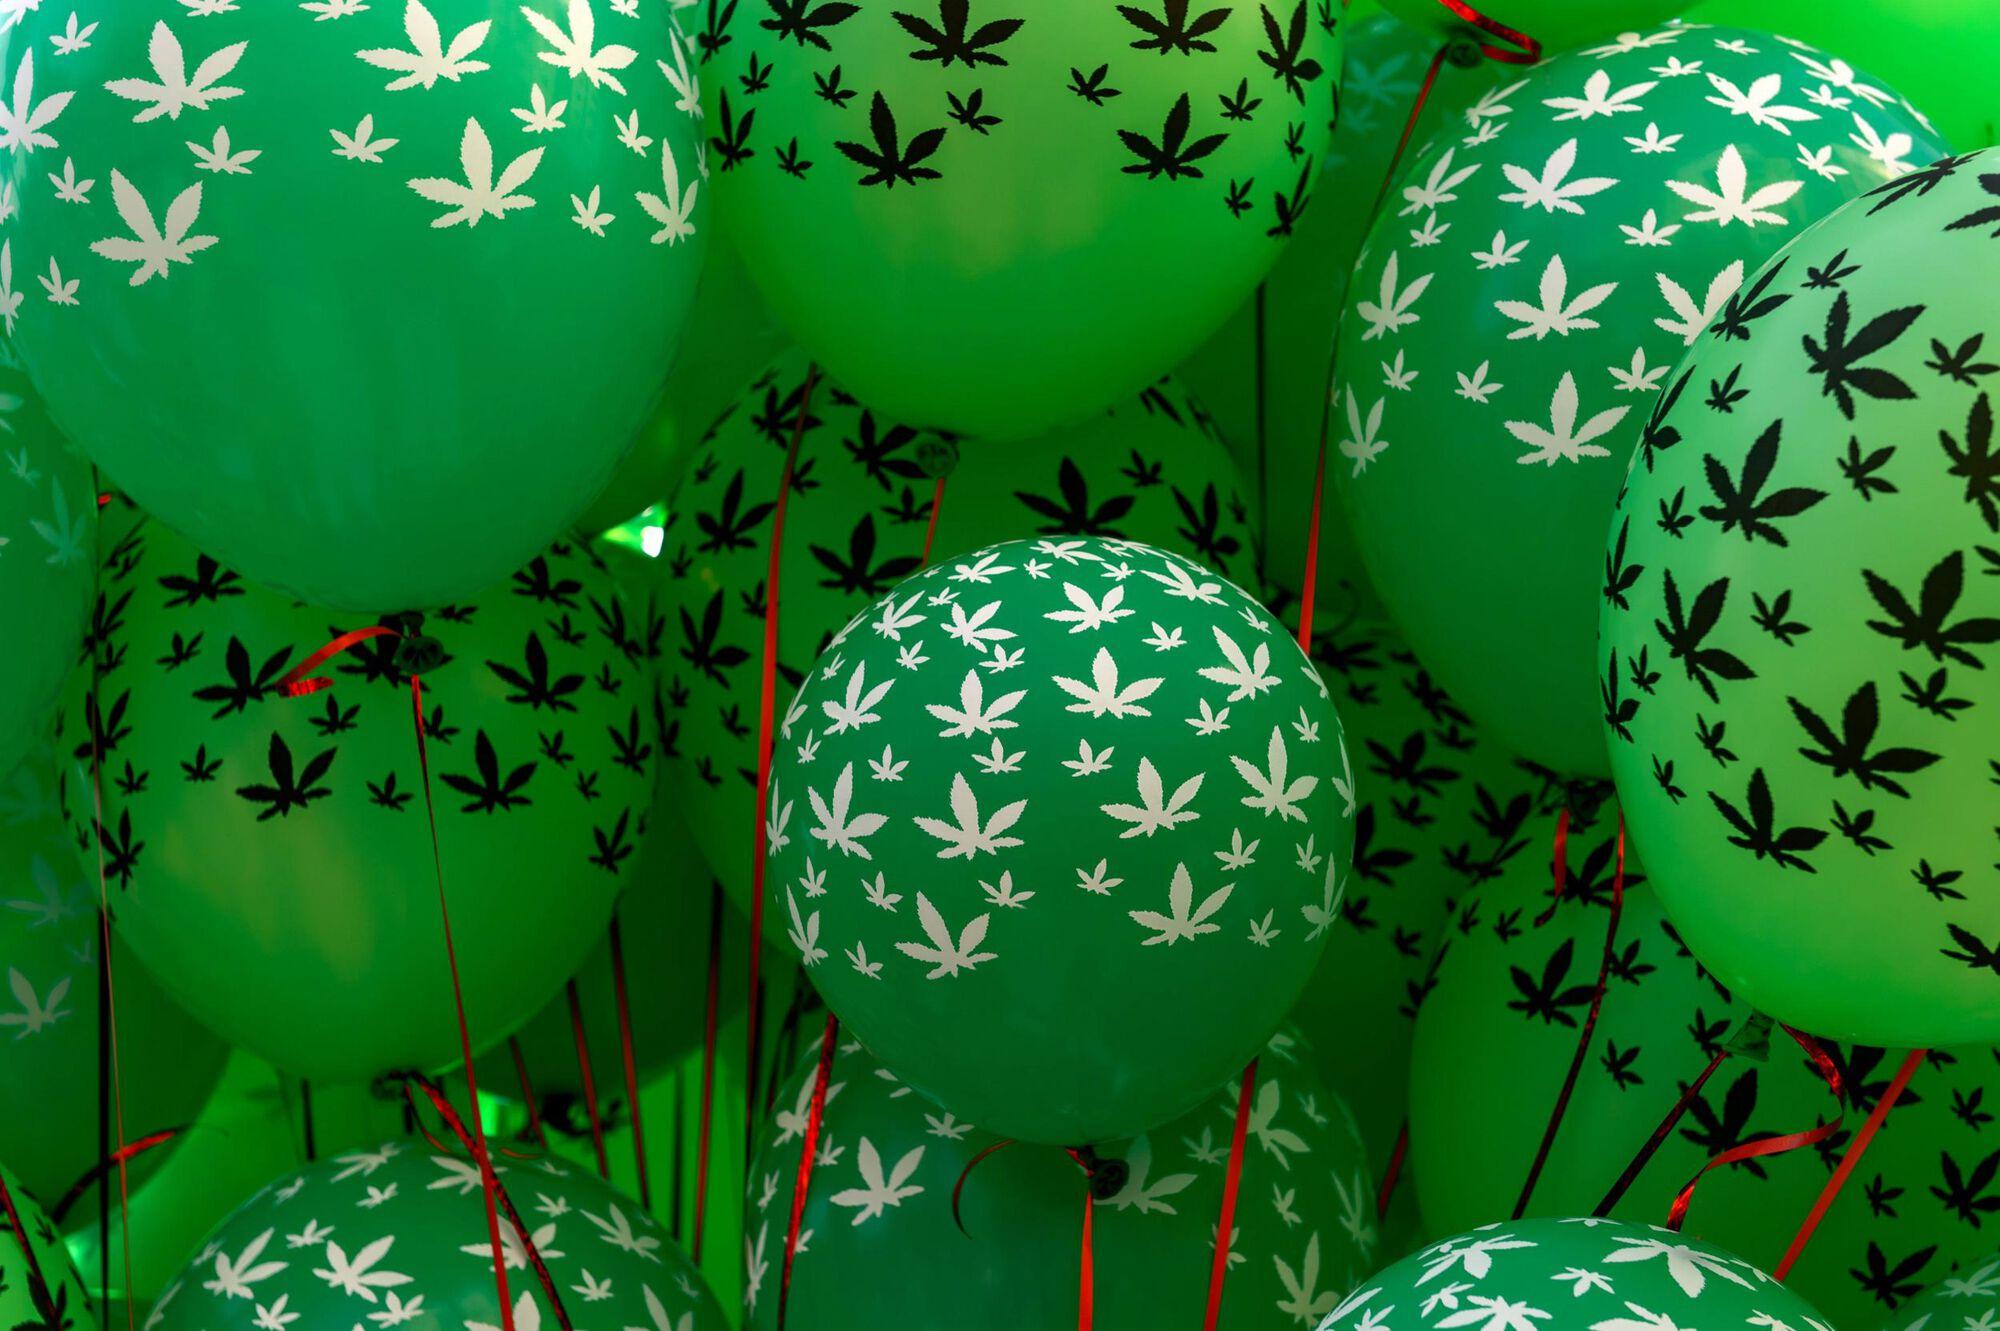 Drogpolitika Magyarorszagon Fu Legalizalasa Marihuana